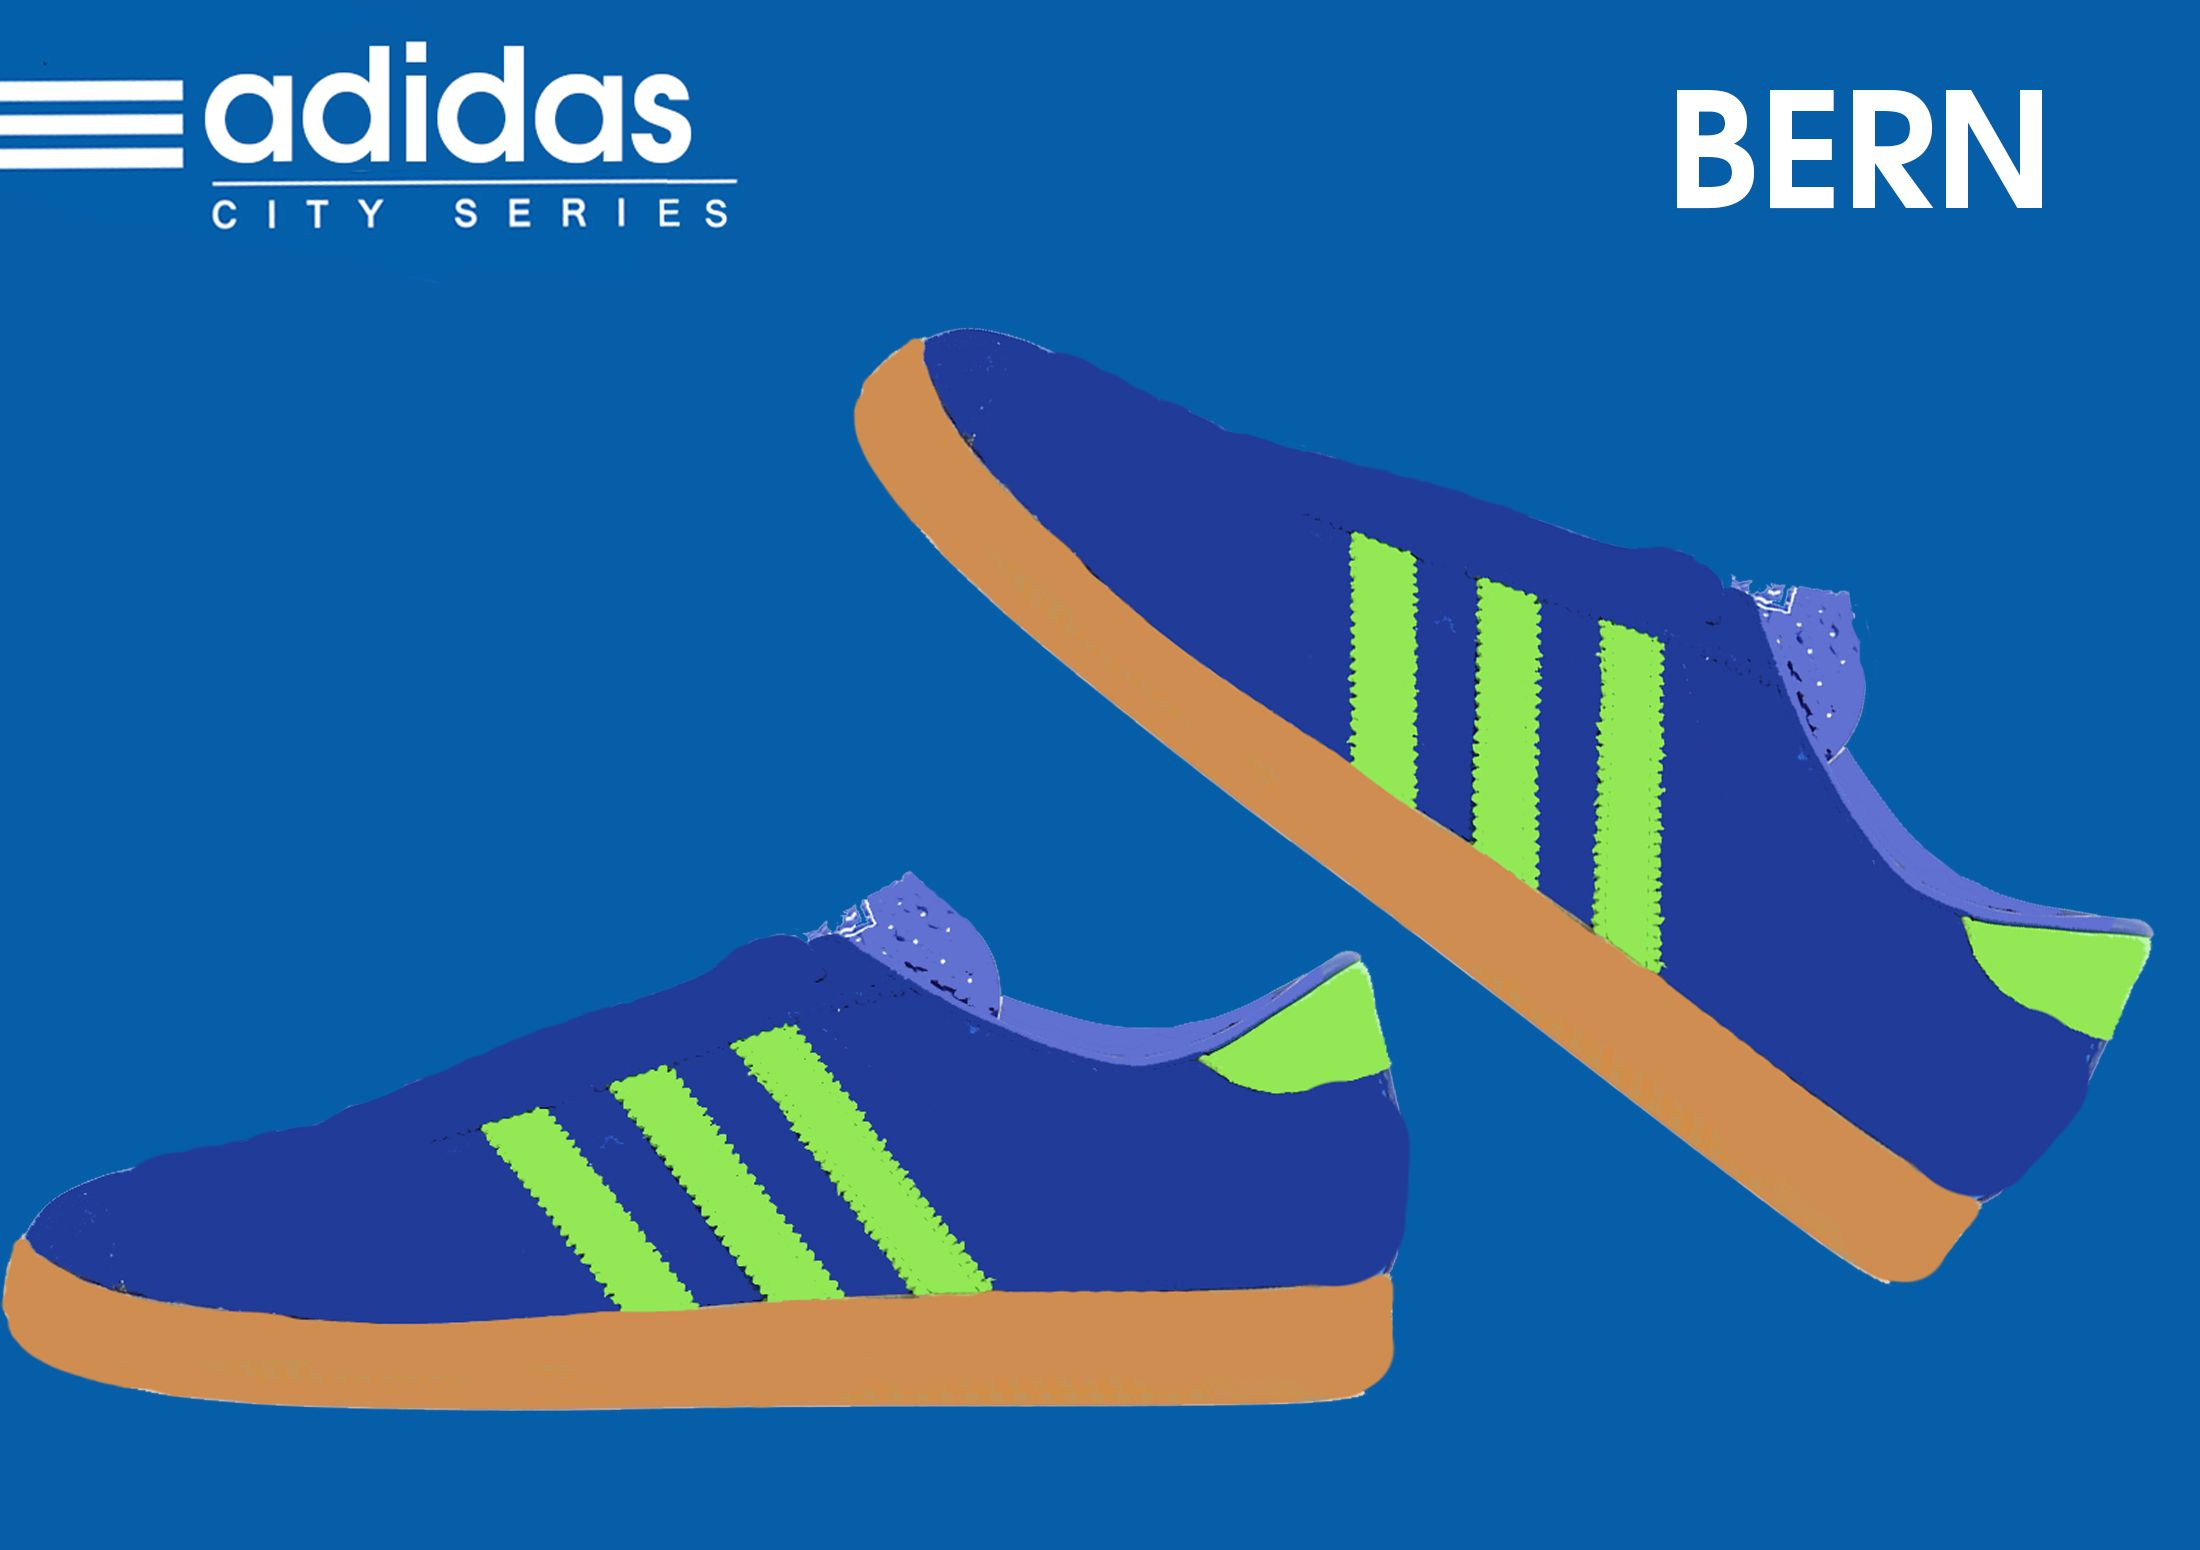 Adidas X Size 2014 City Series Bern Adidas Poster Adidas Art